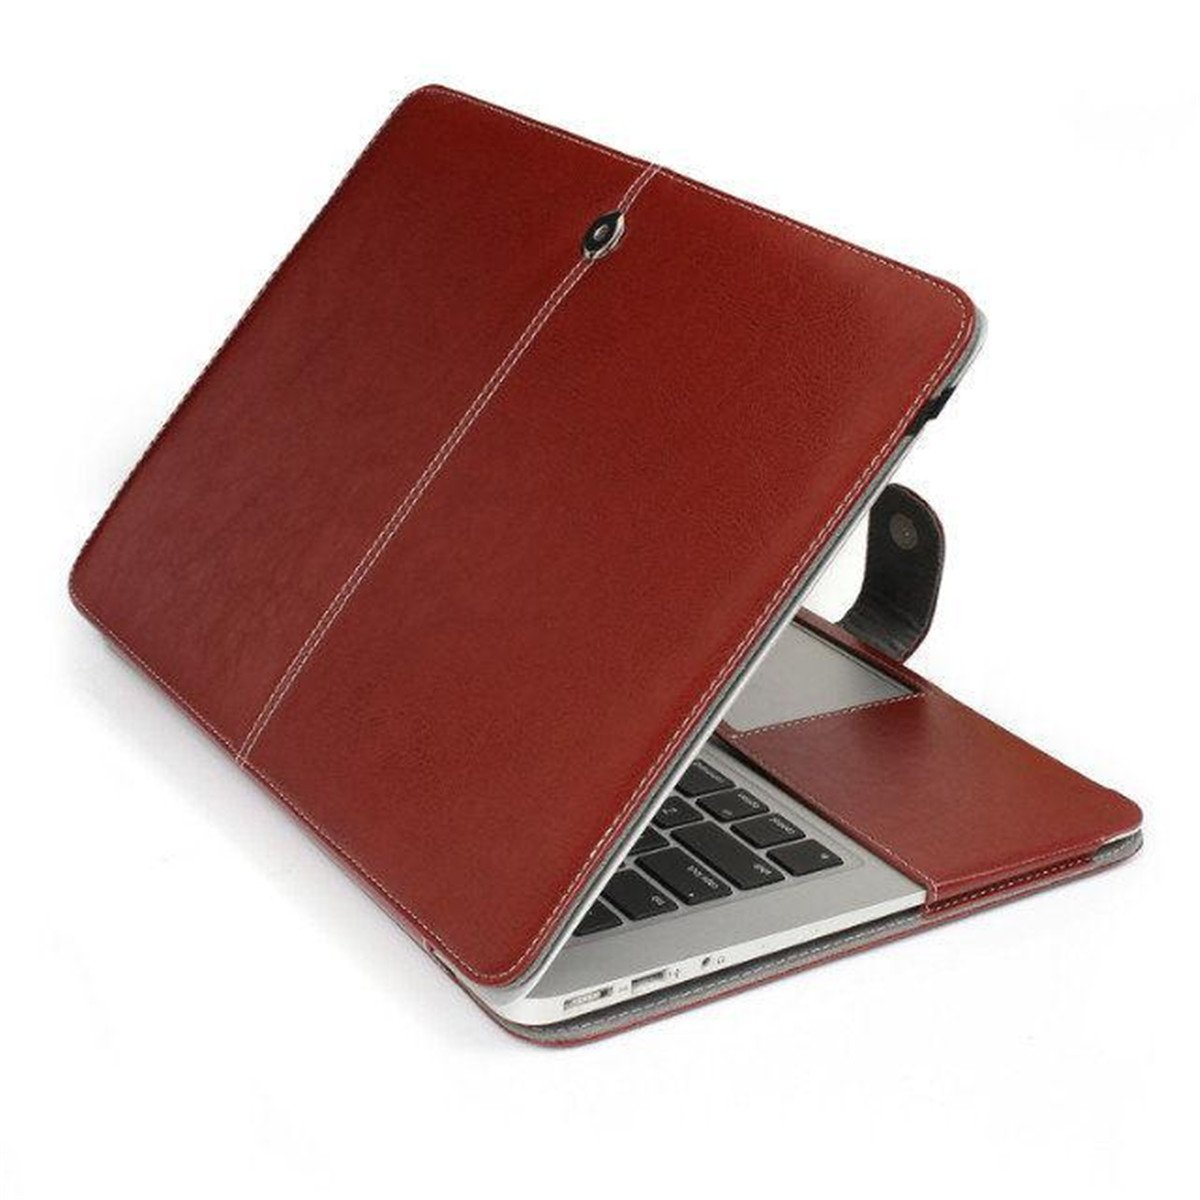 Macbook airのおしゃれカバーを厳選!レザーが熱い